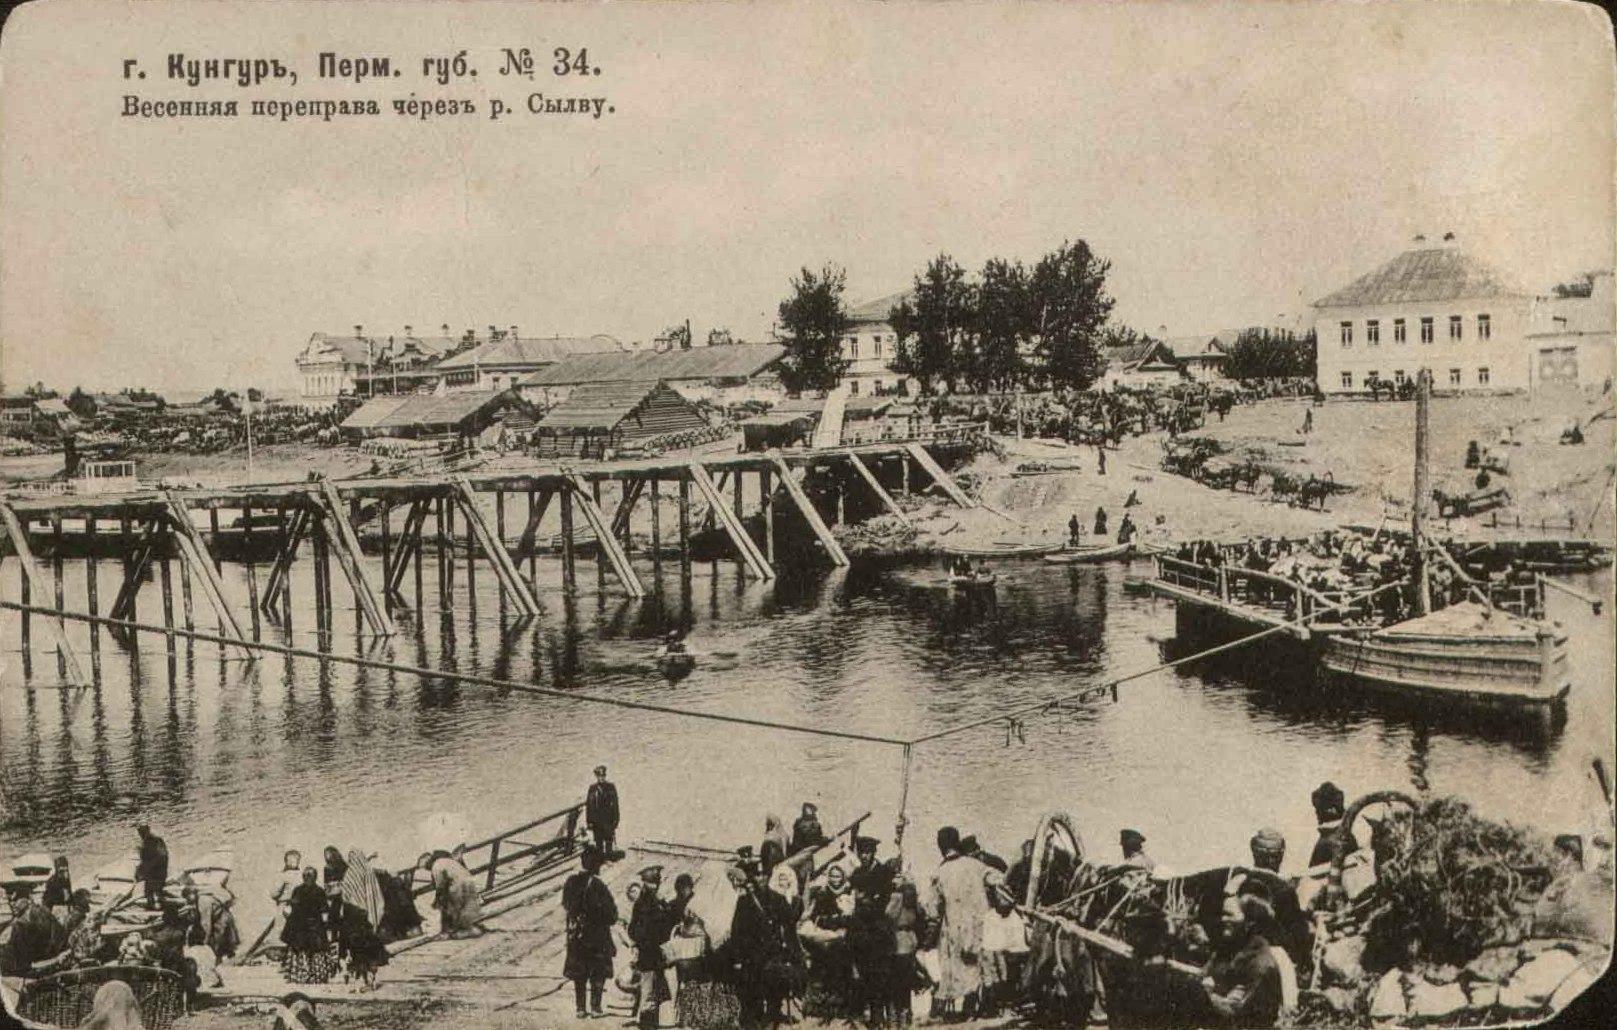 Весенняя переправа через реку Сылву